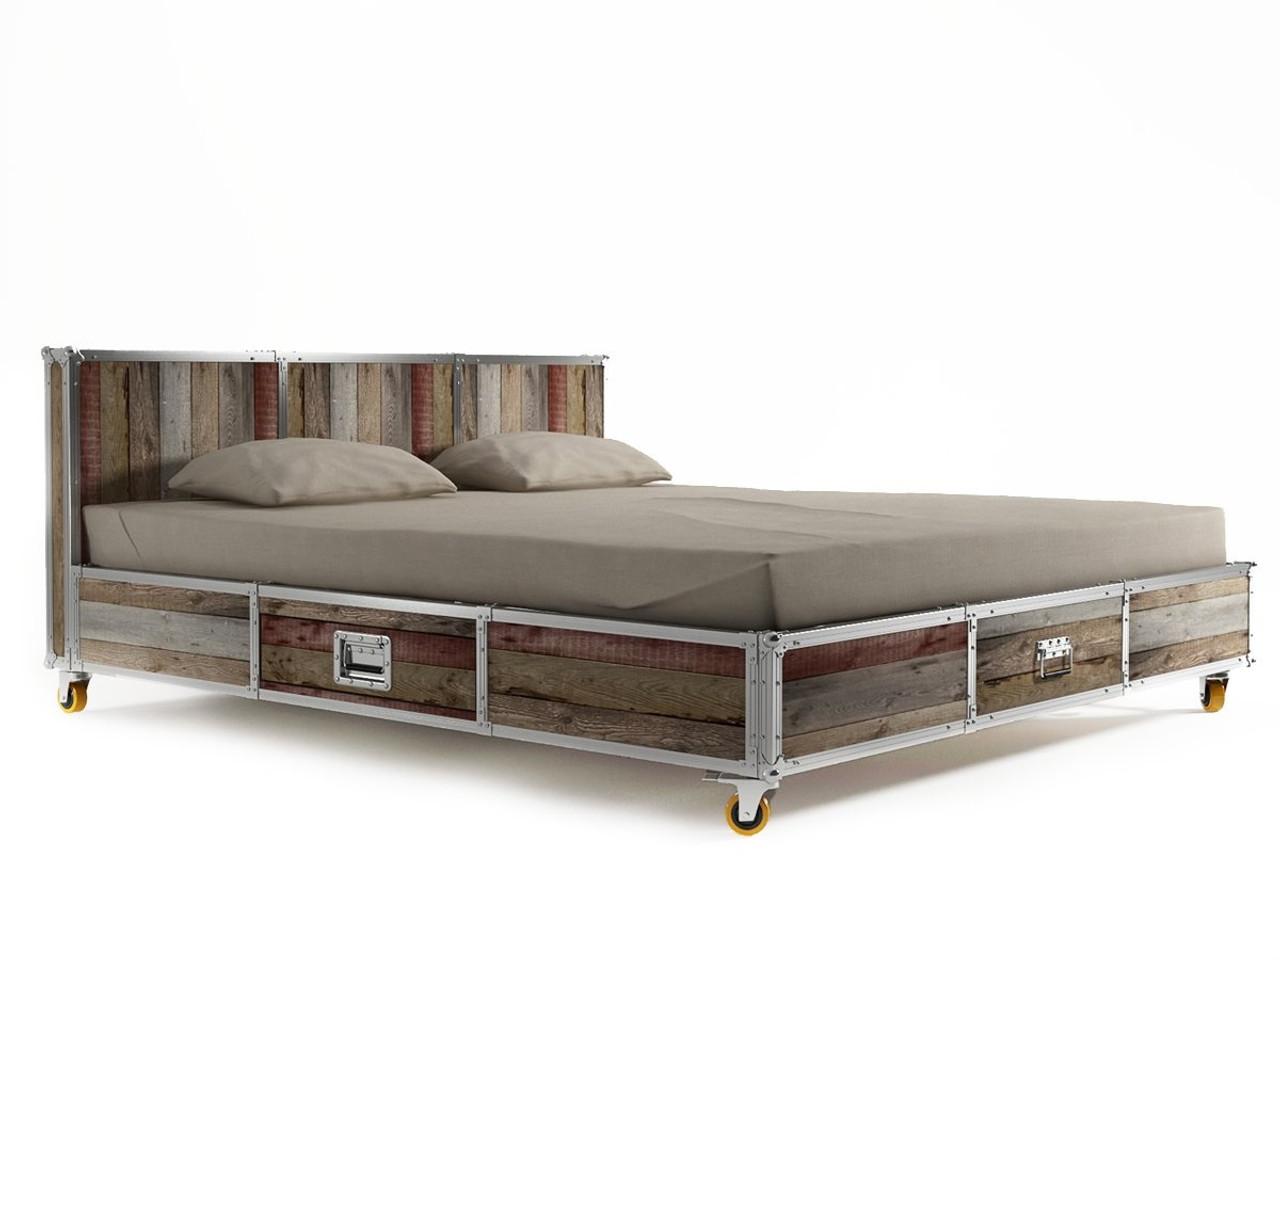 Industrial Loft Reclaimed Teak King Platform Storage Bed  sc 1 st  Zin Home & Industrial Loft Reclaimed Teak King Size Platform Storage Bed